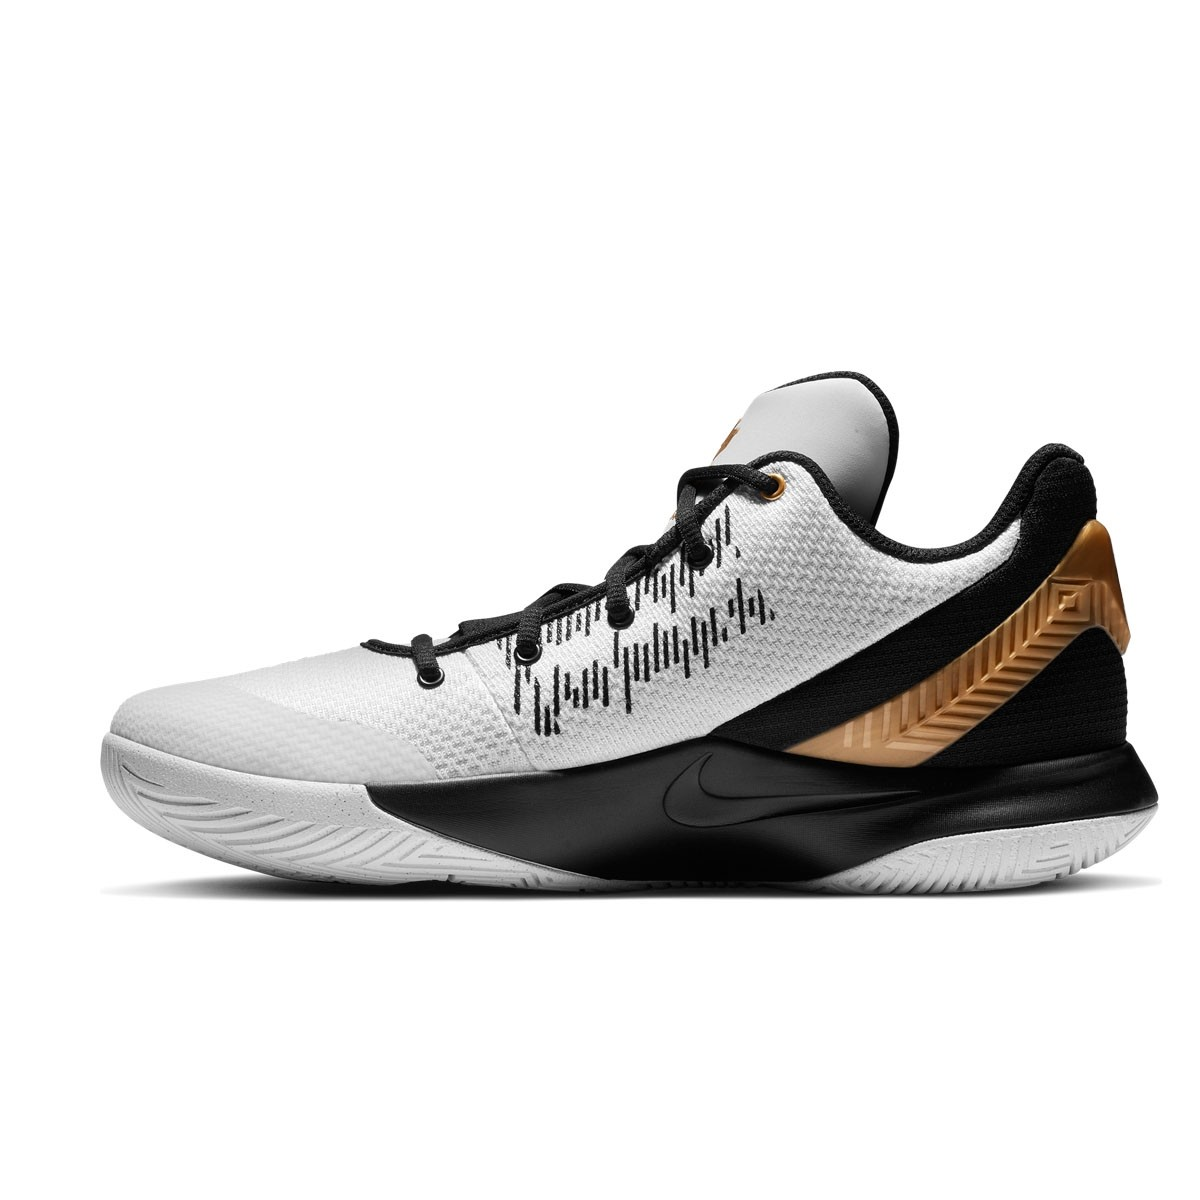 Nike Kyrie Flytrap II 'Black Gold' AO4436-170